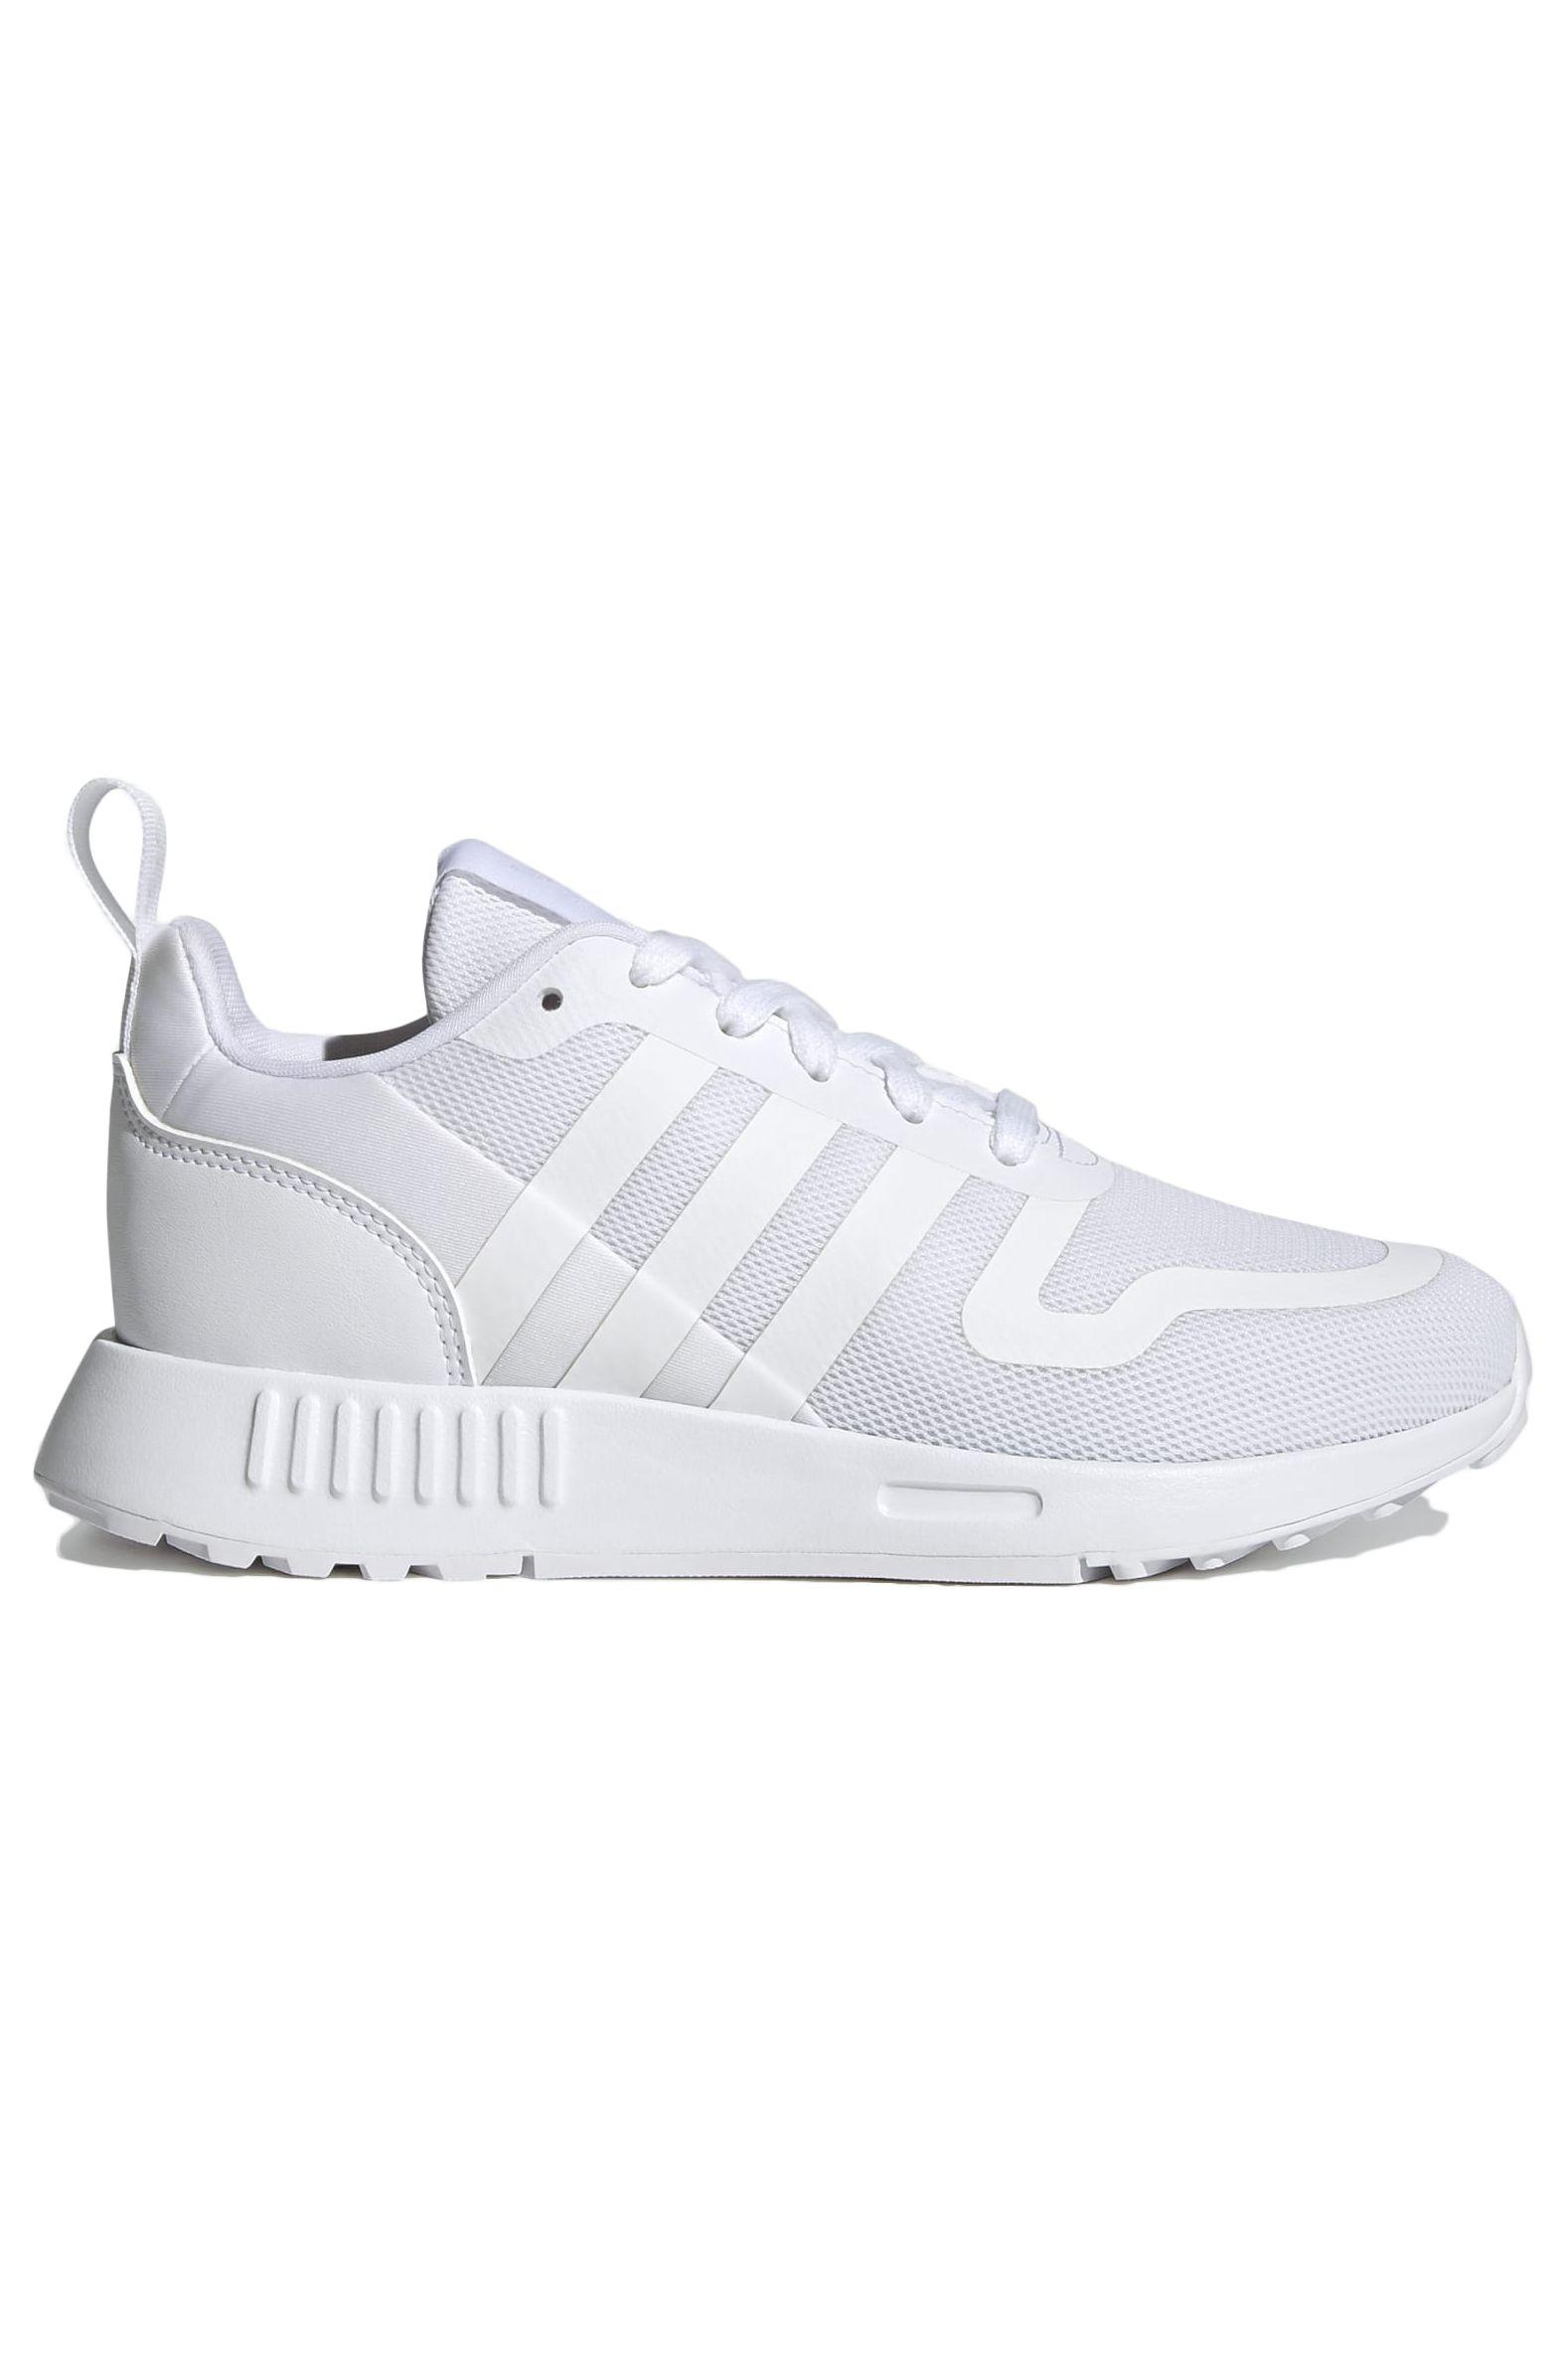 Adidas Shoes MULTIX J Ftwrwhite